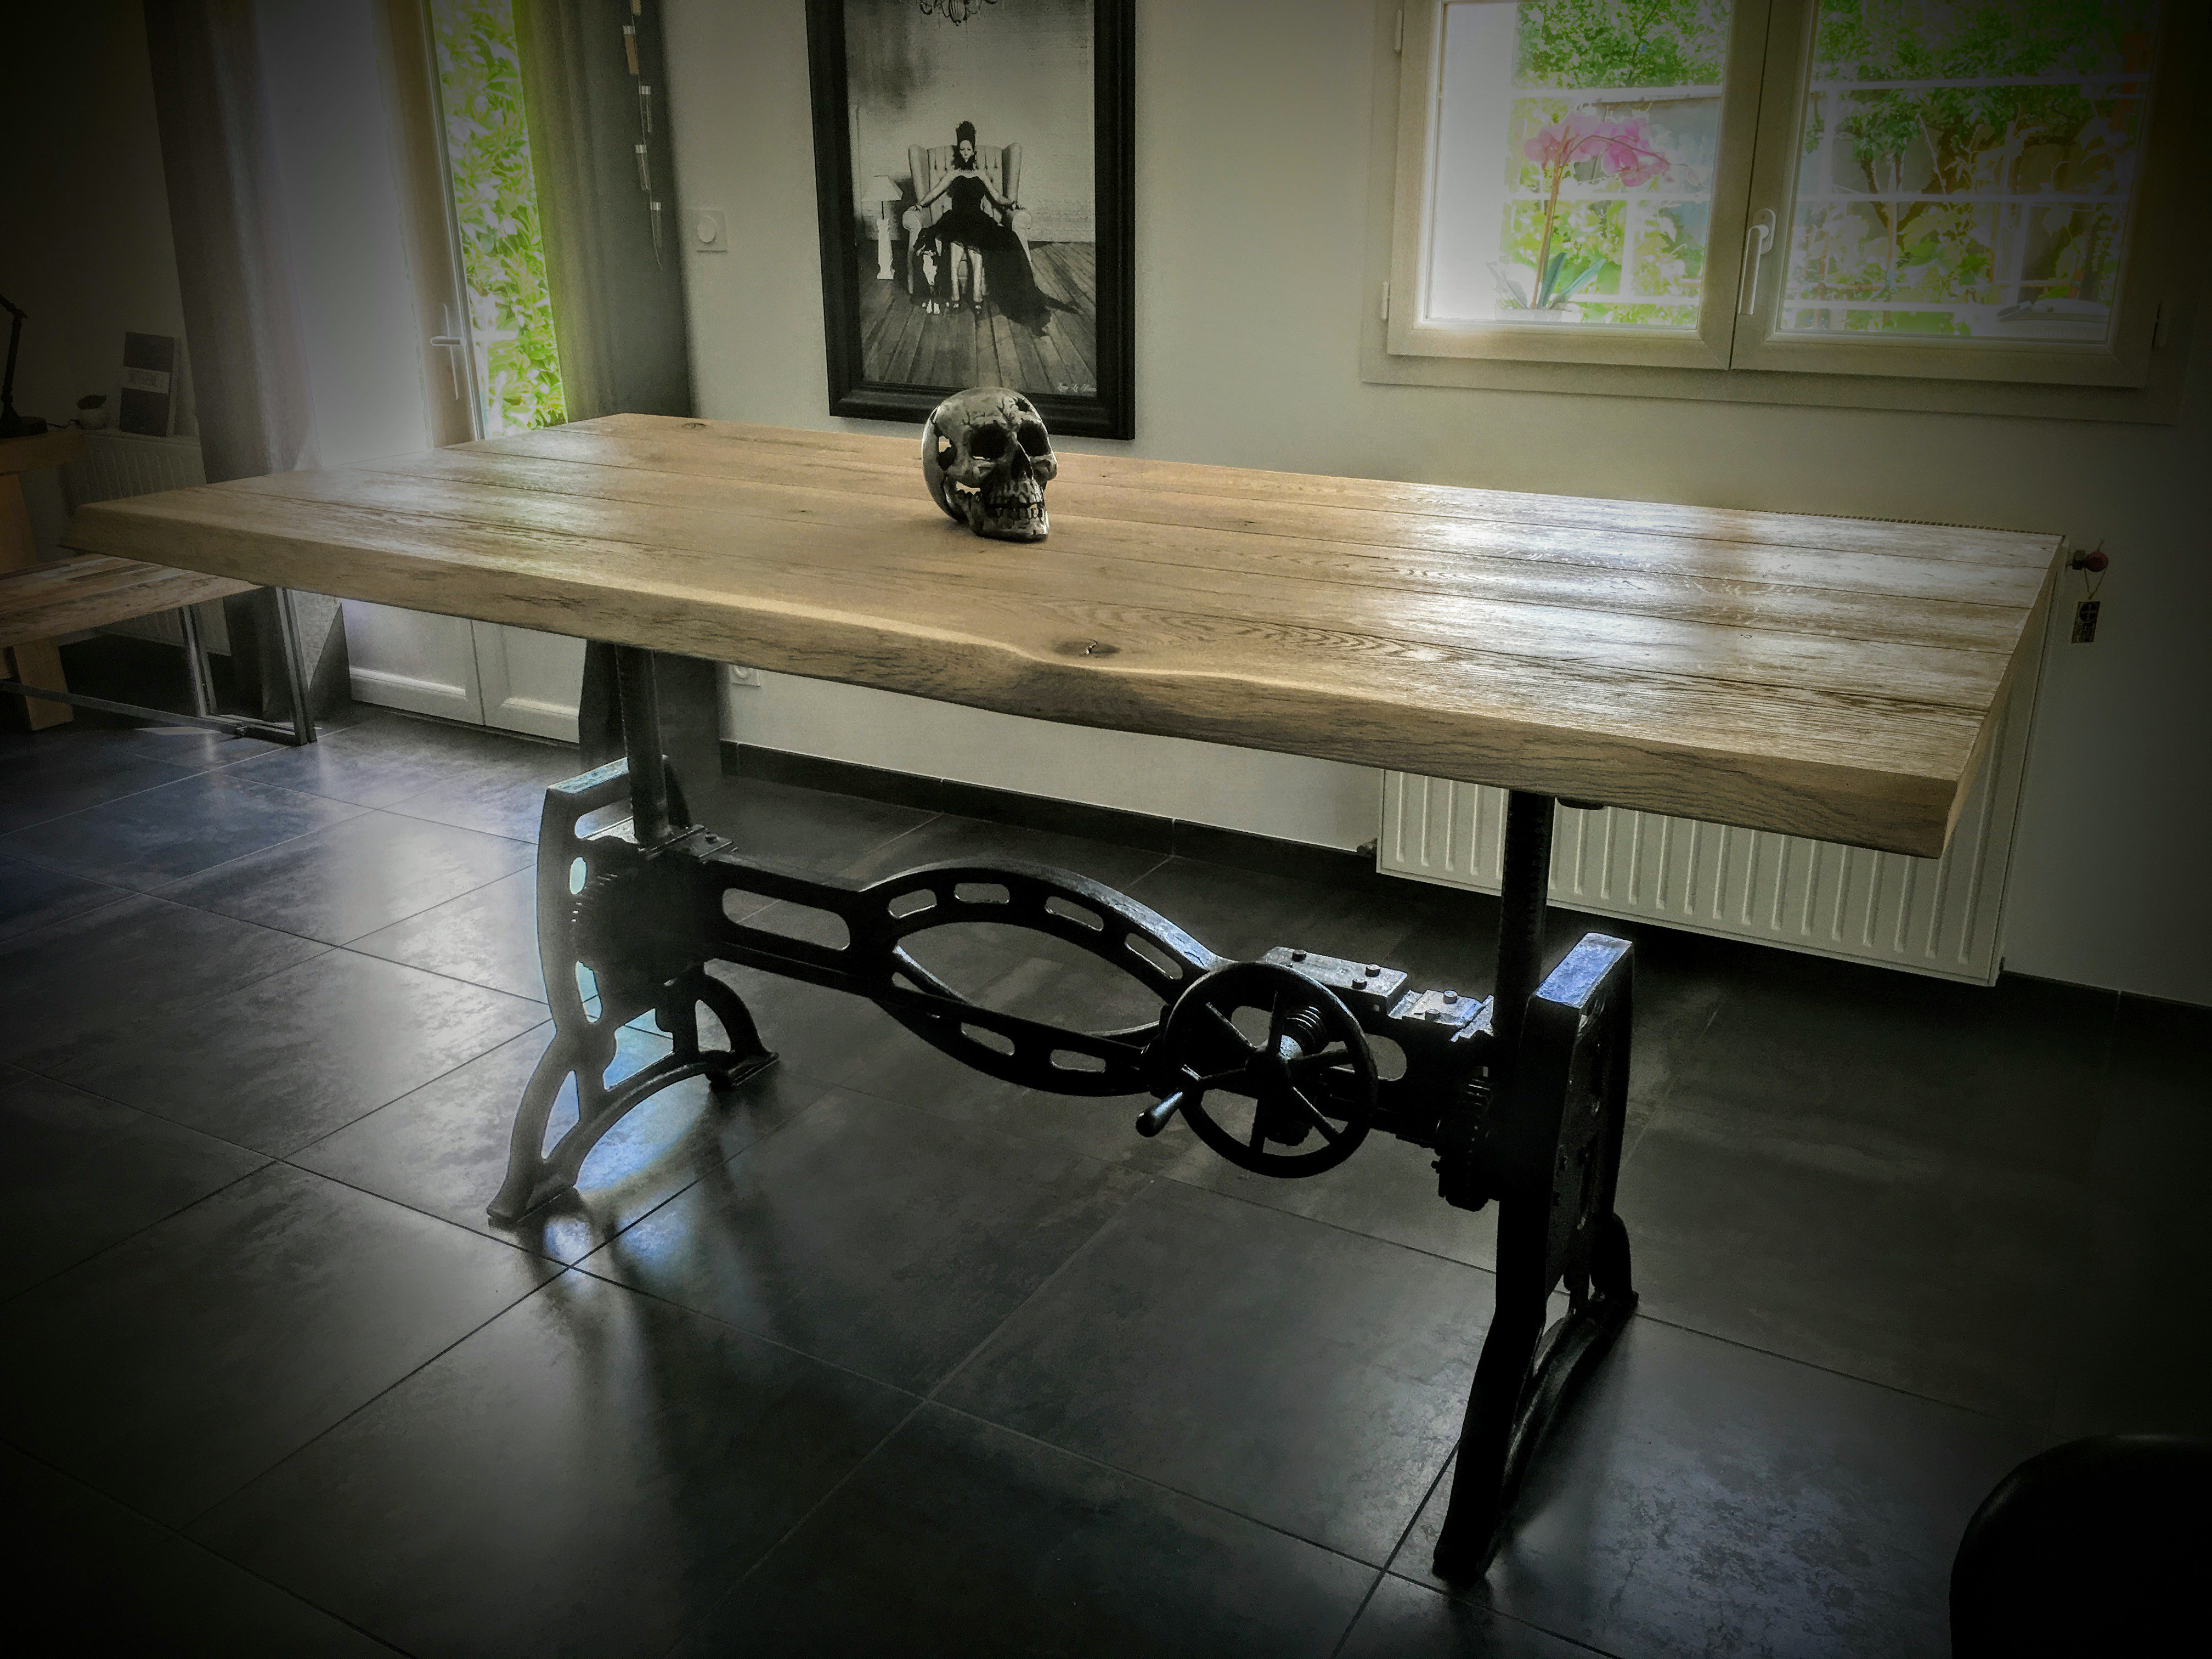 Table Elevatrice Pied Rond En Fonte Bois Metal Style Industriel